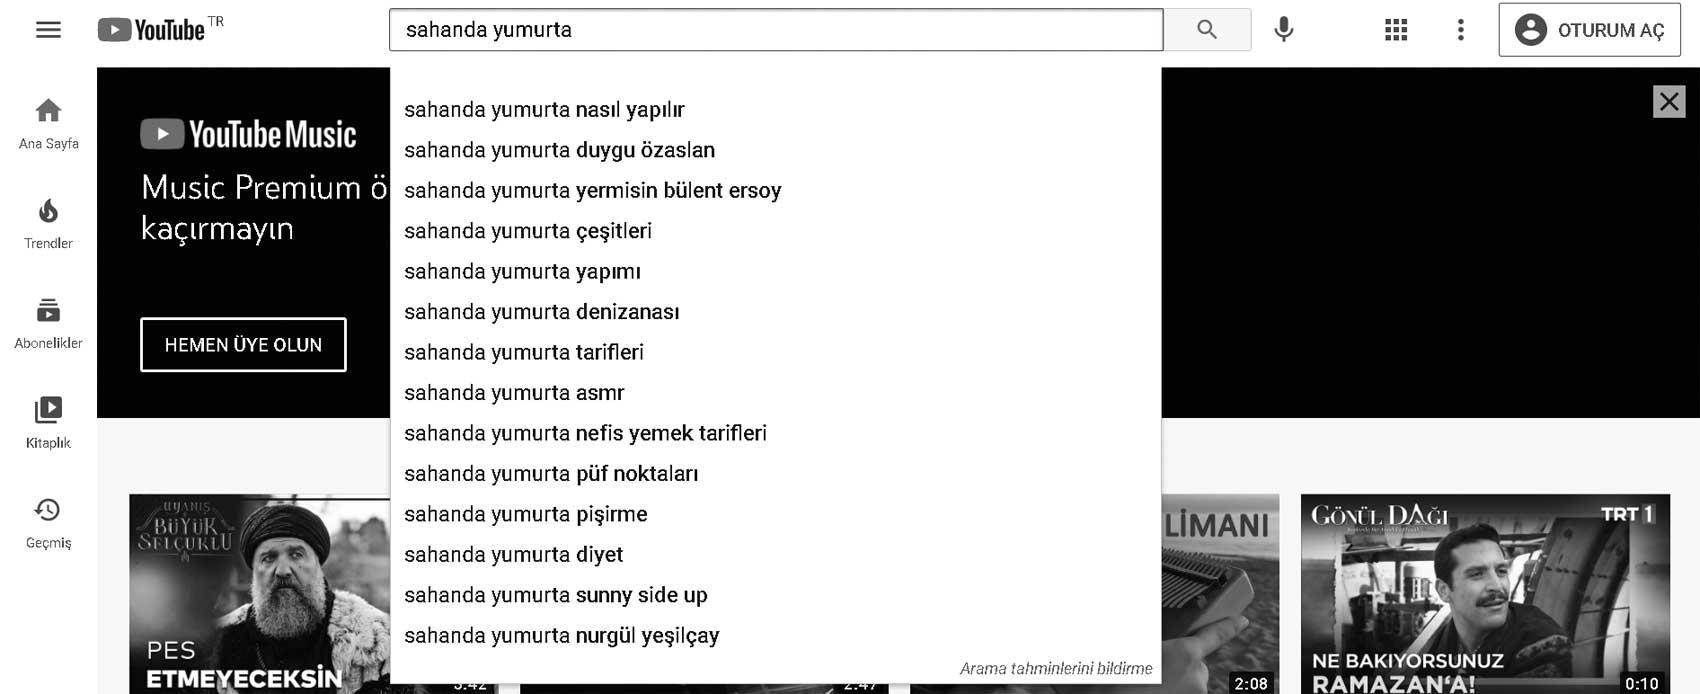 Youtube video arama tamamlama